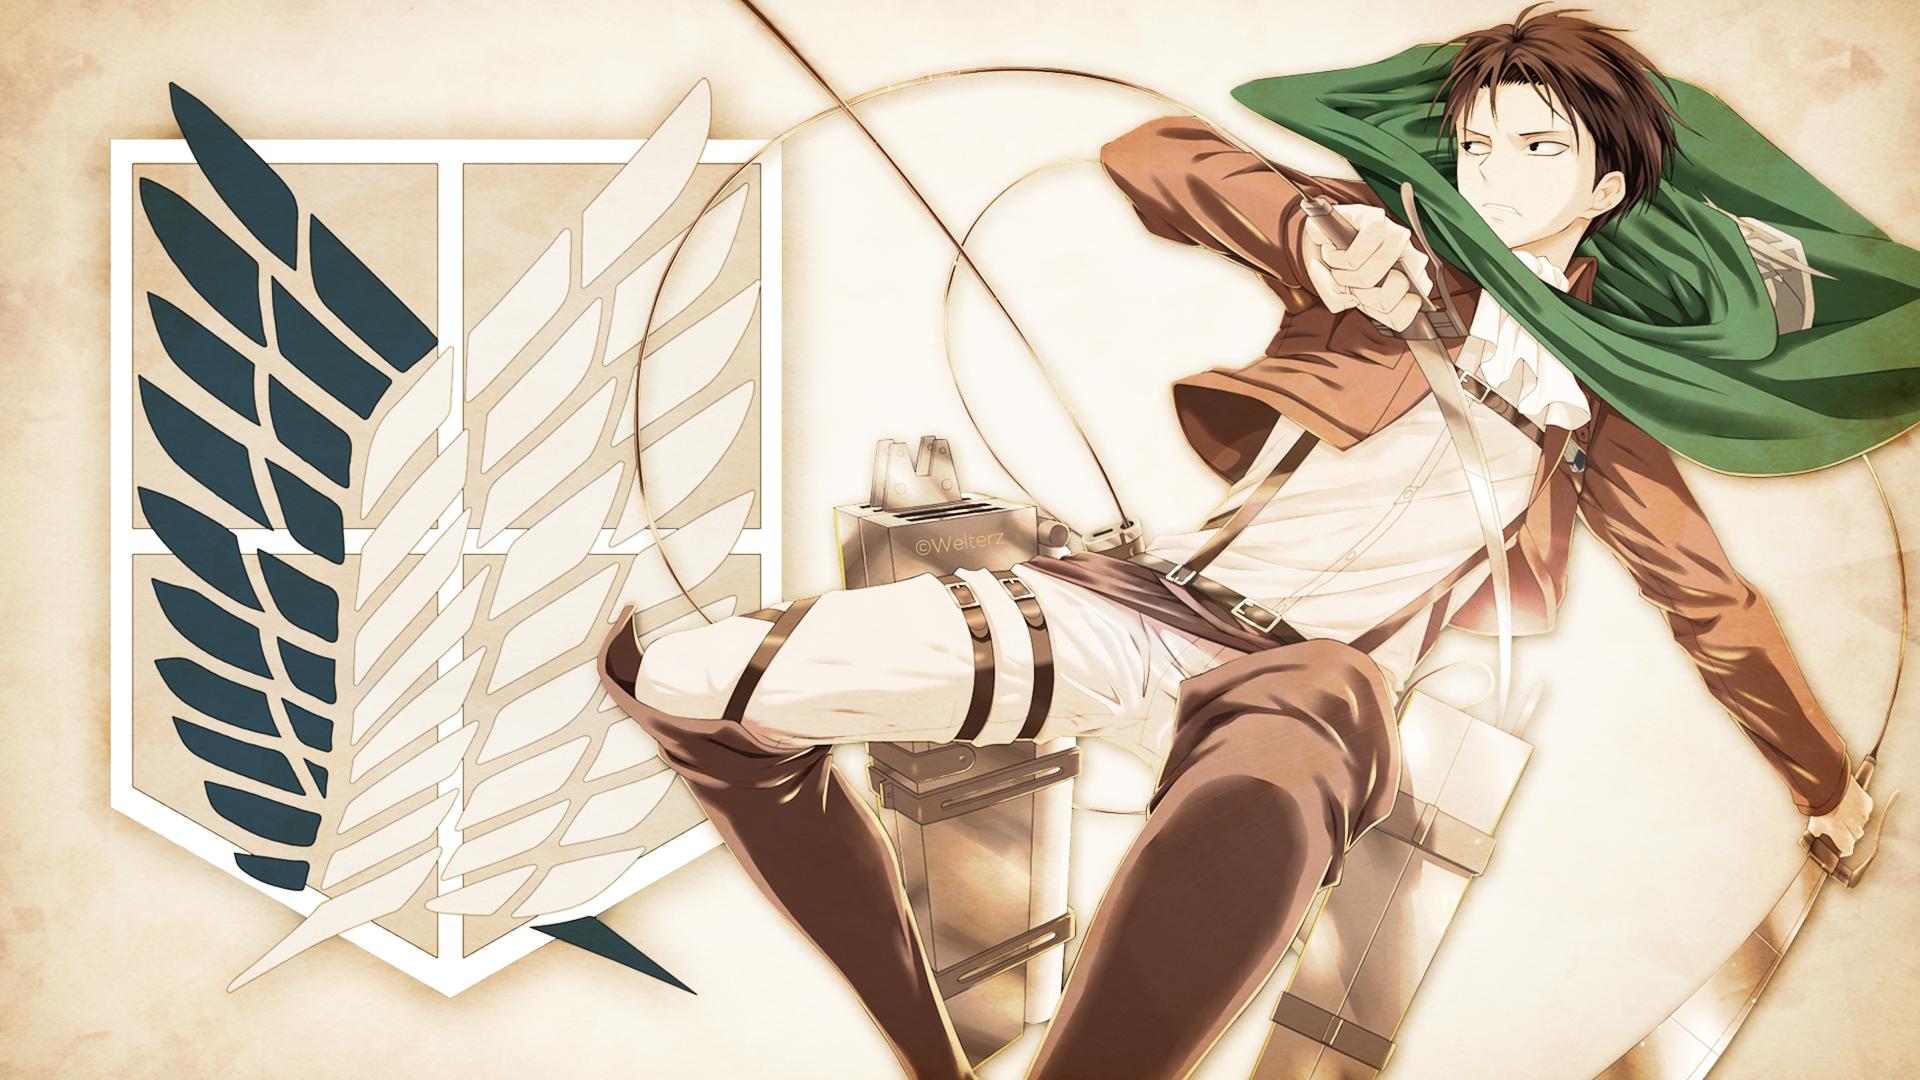 Anime Wallpaper Attack On Titan Levi - HD Wallpaper